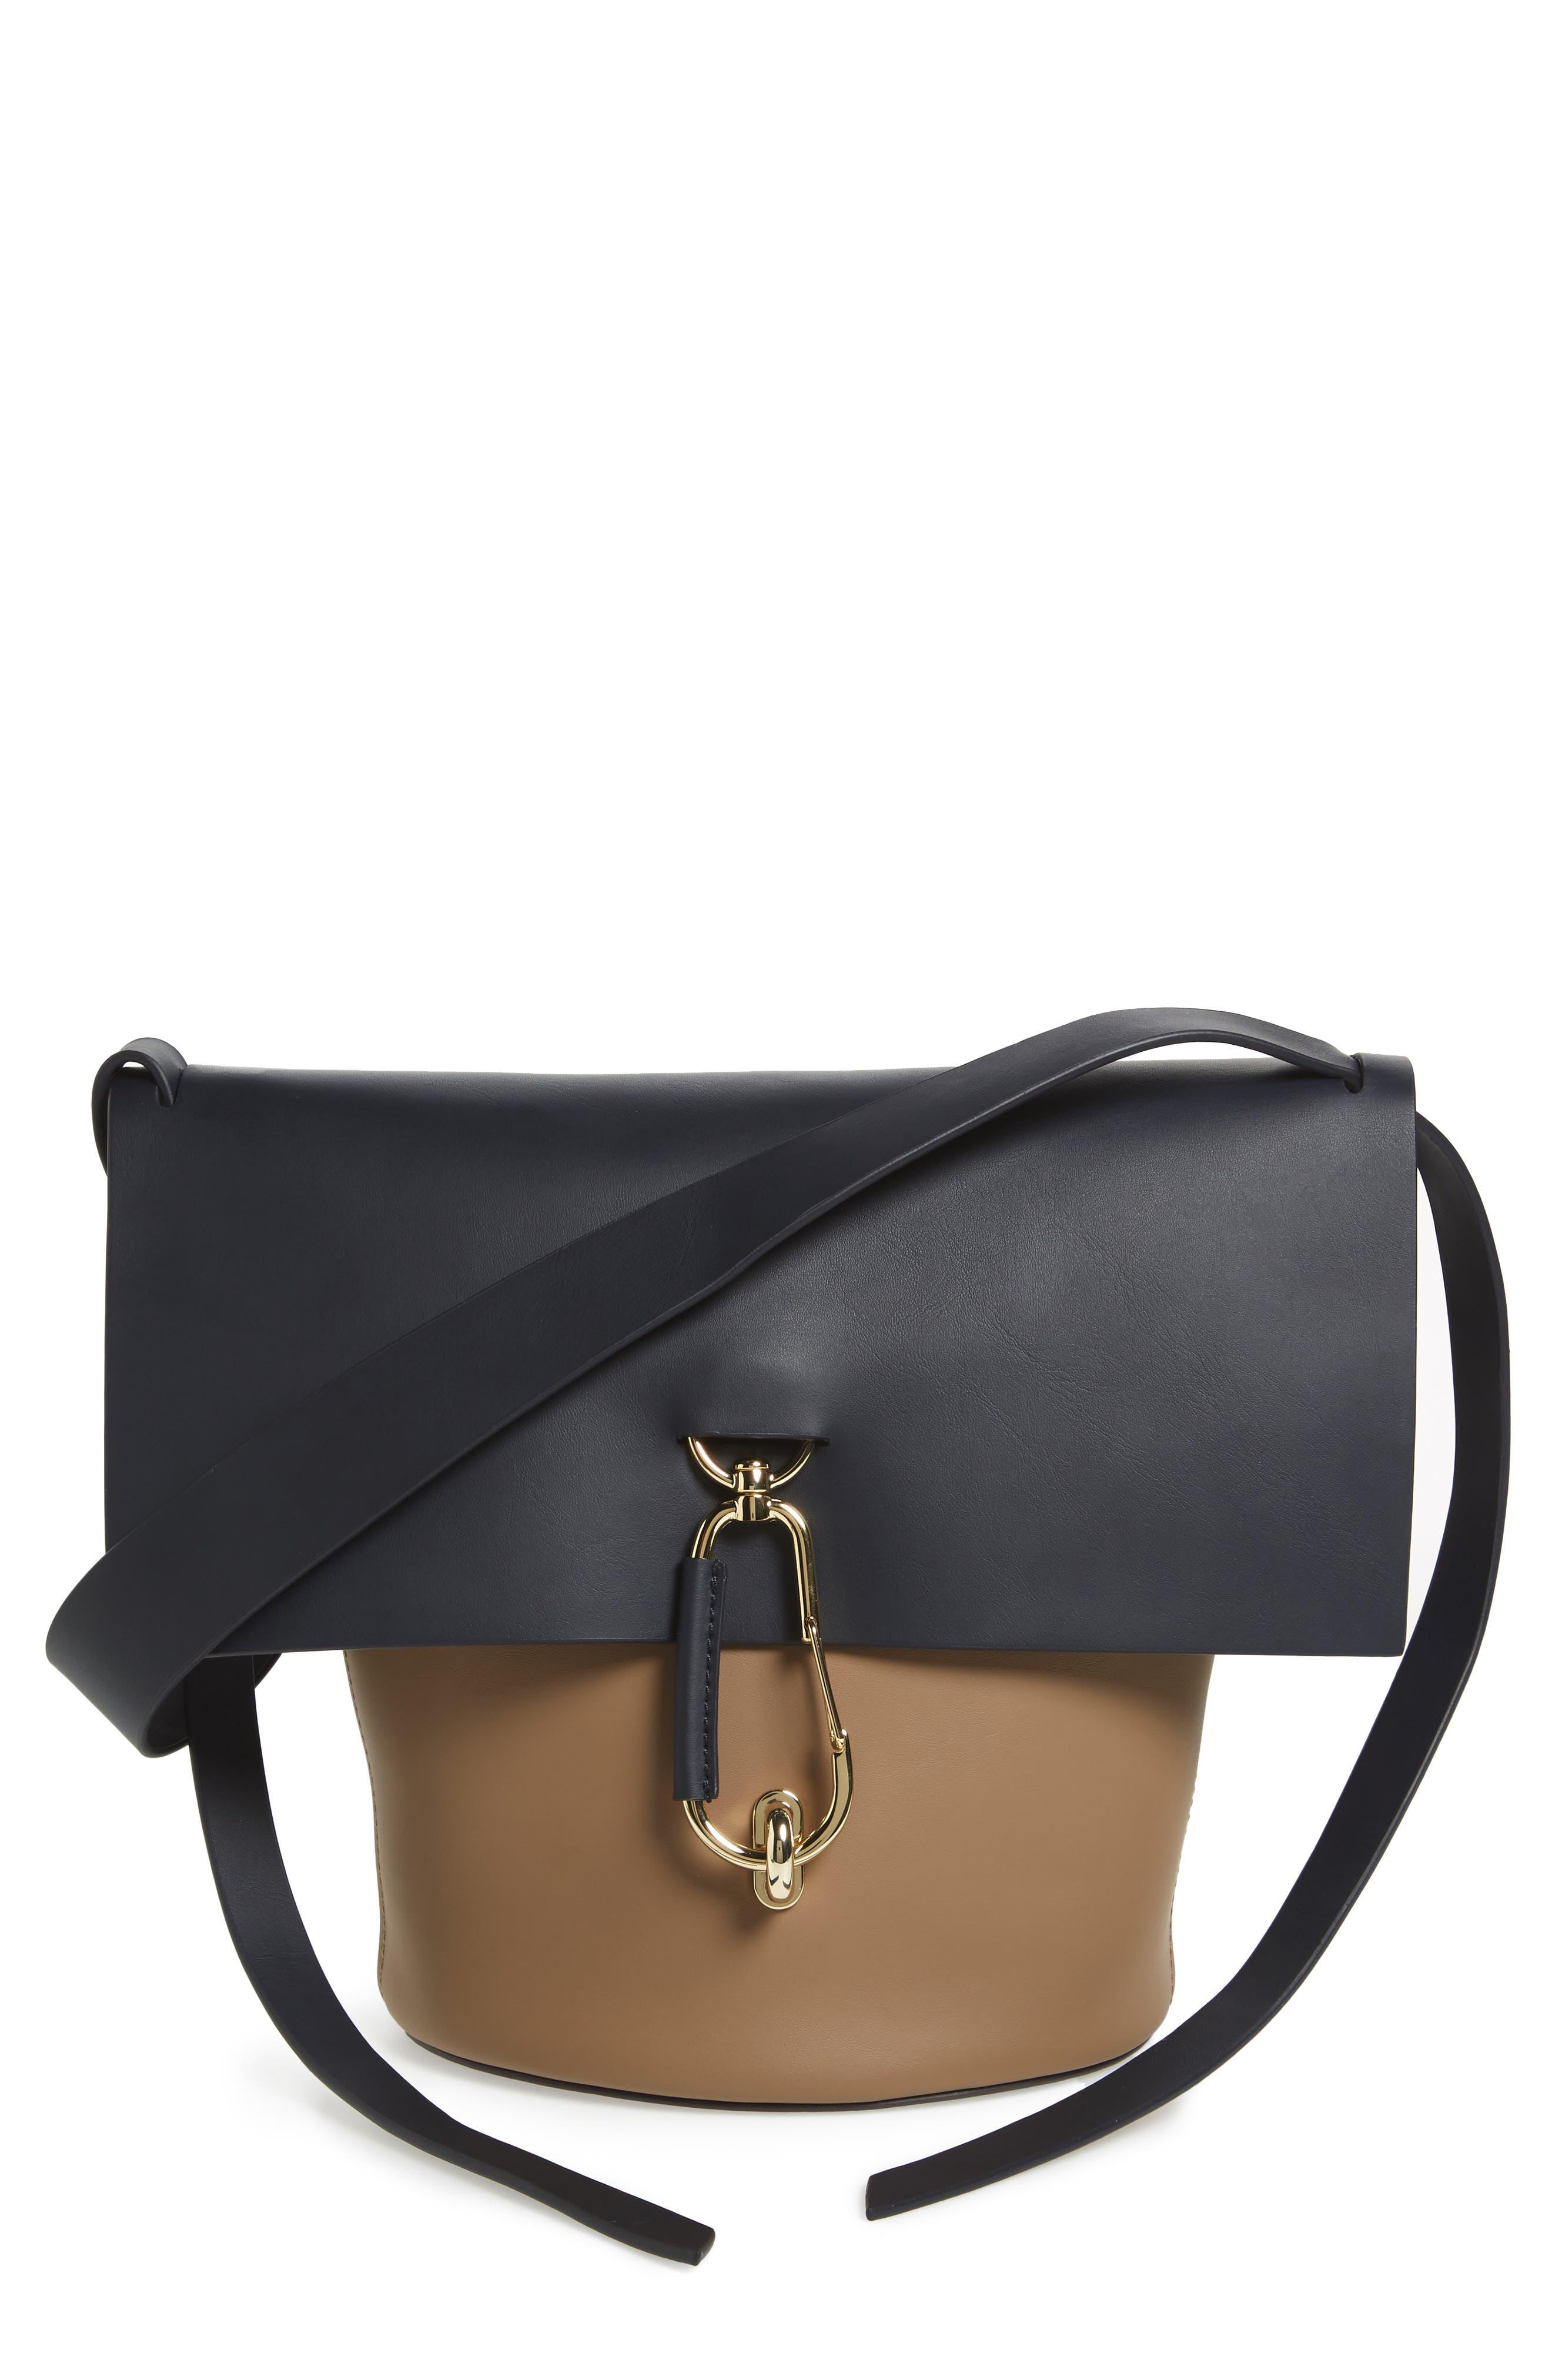 Alternate Image 1 Selected - ZAC Zac Posen Belay Colorblock Calfskin Leather Bucket Bag